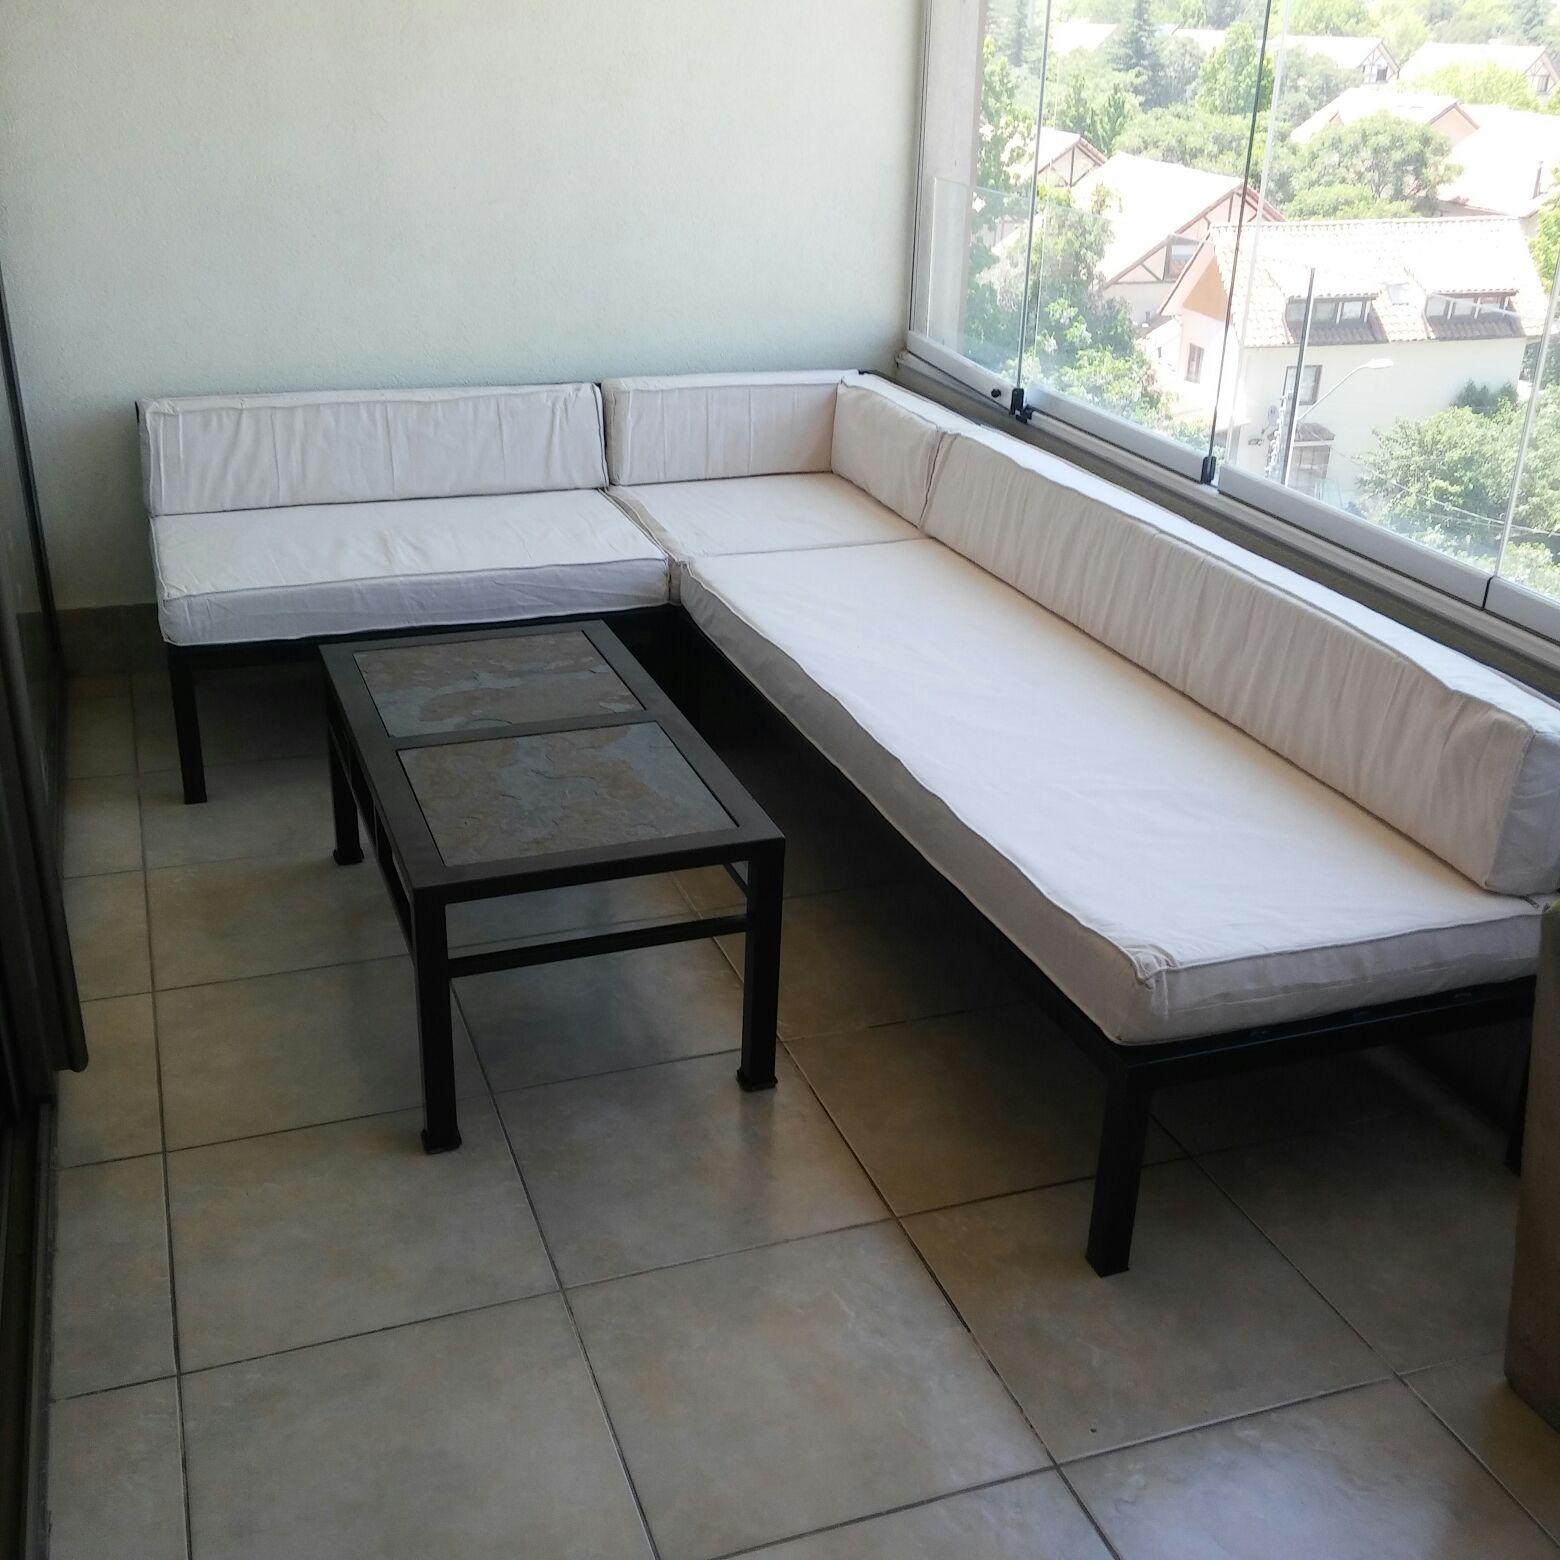 Living de terraza fierro seccional respaldo bajo 390 for Muebles terraza fierro